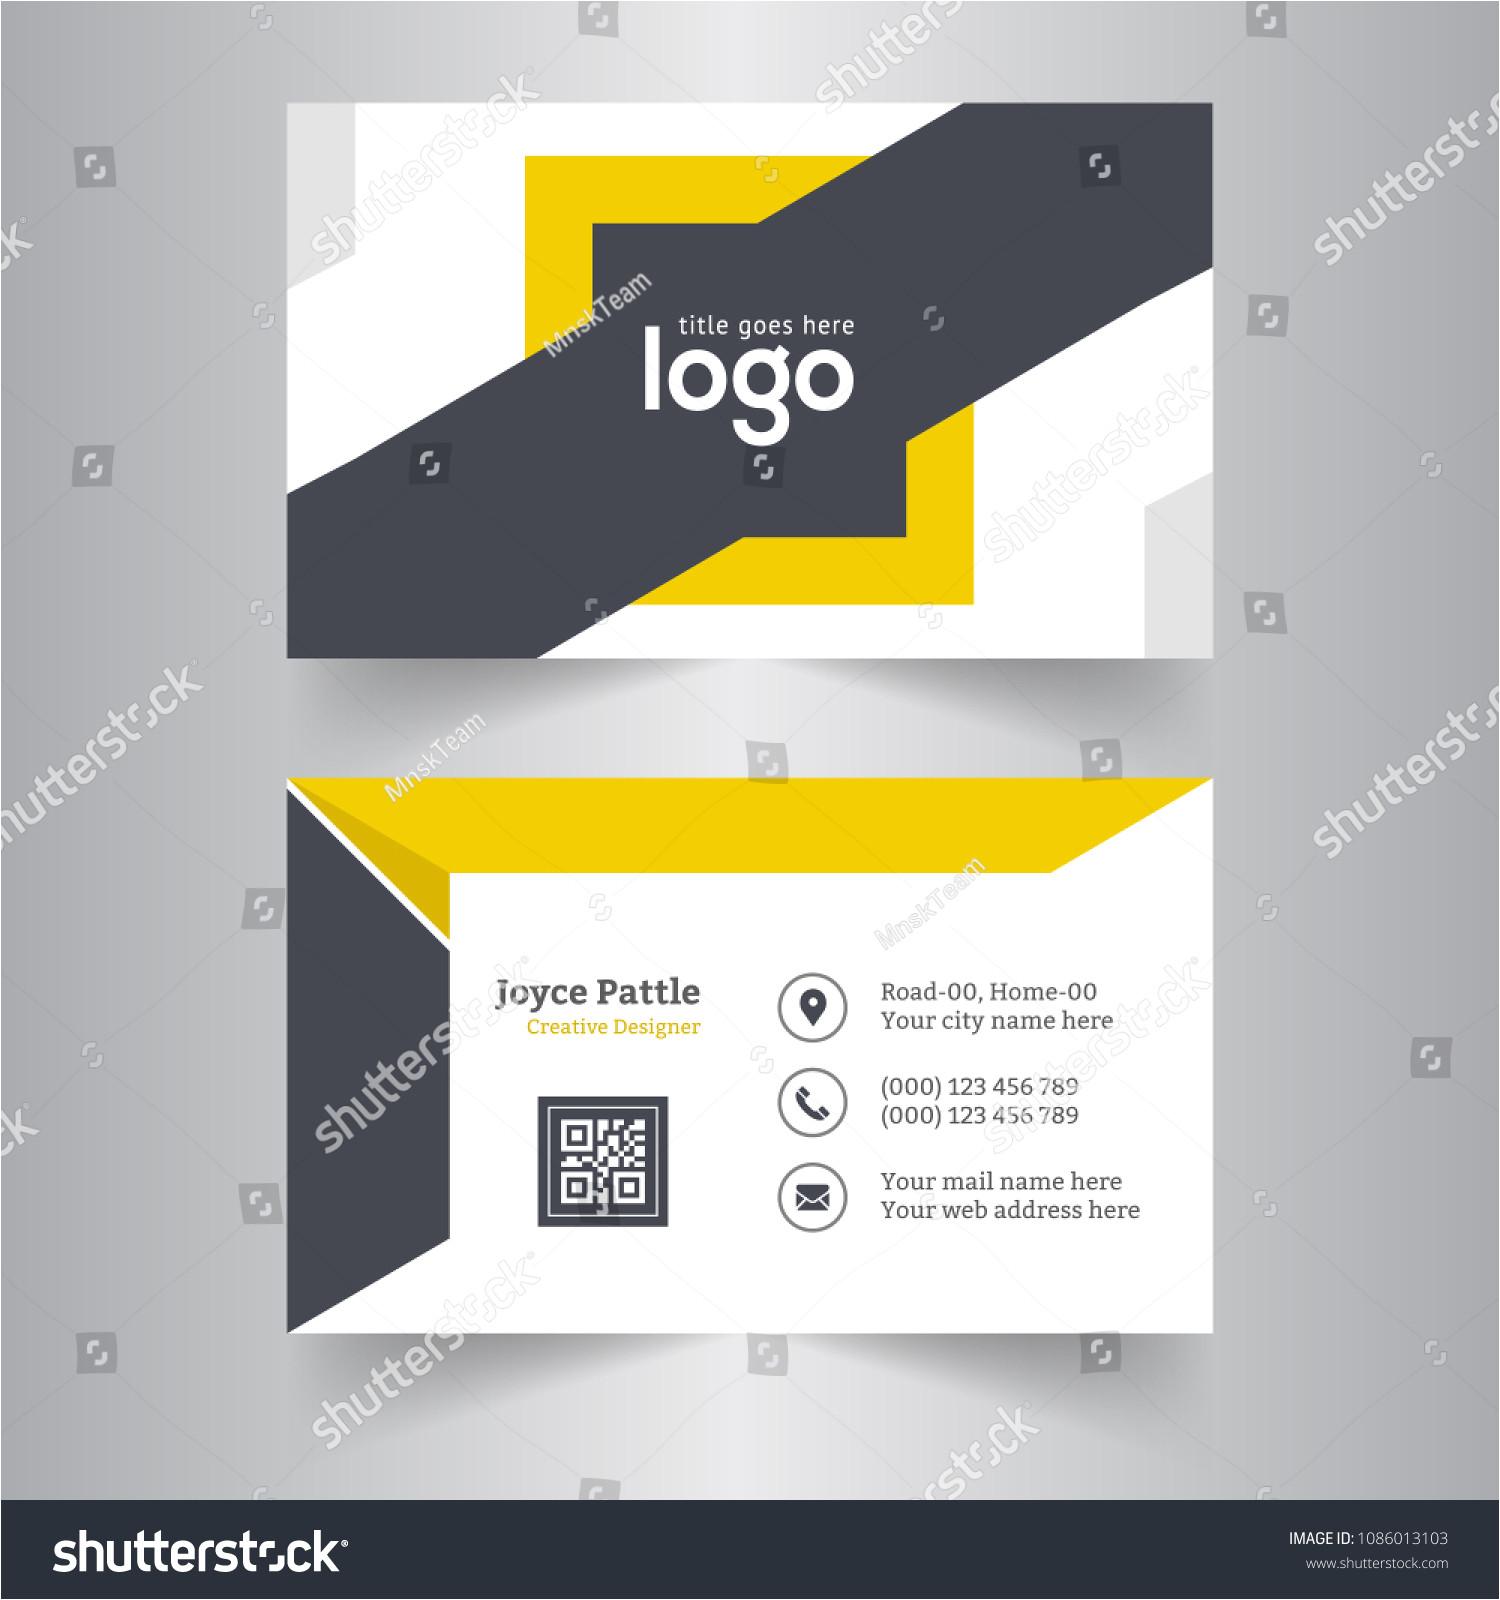 stock vector creative business card creative and clean business card template modern business card design 1086013103 jpg